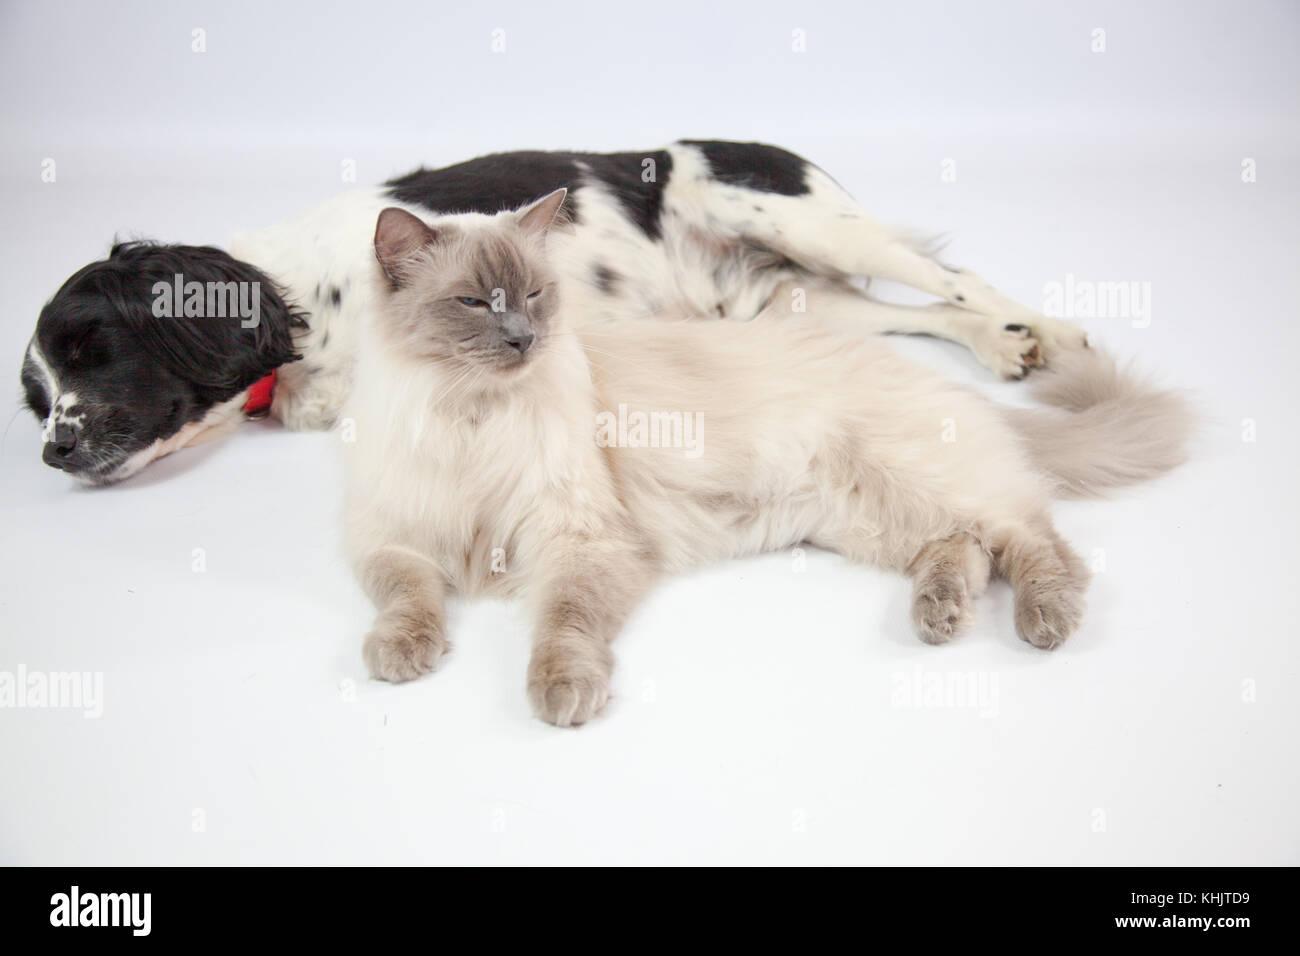 Ragdoll Cat Springer Spaniel In A Photoshoot Stock Photo